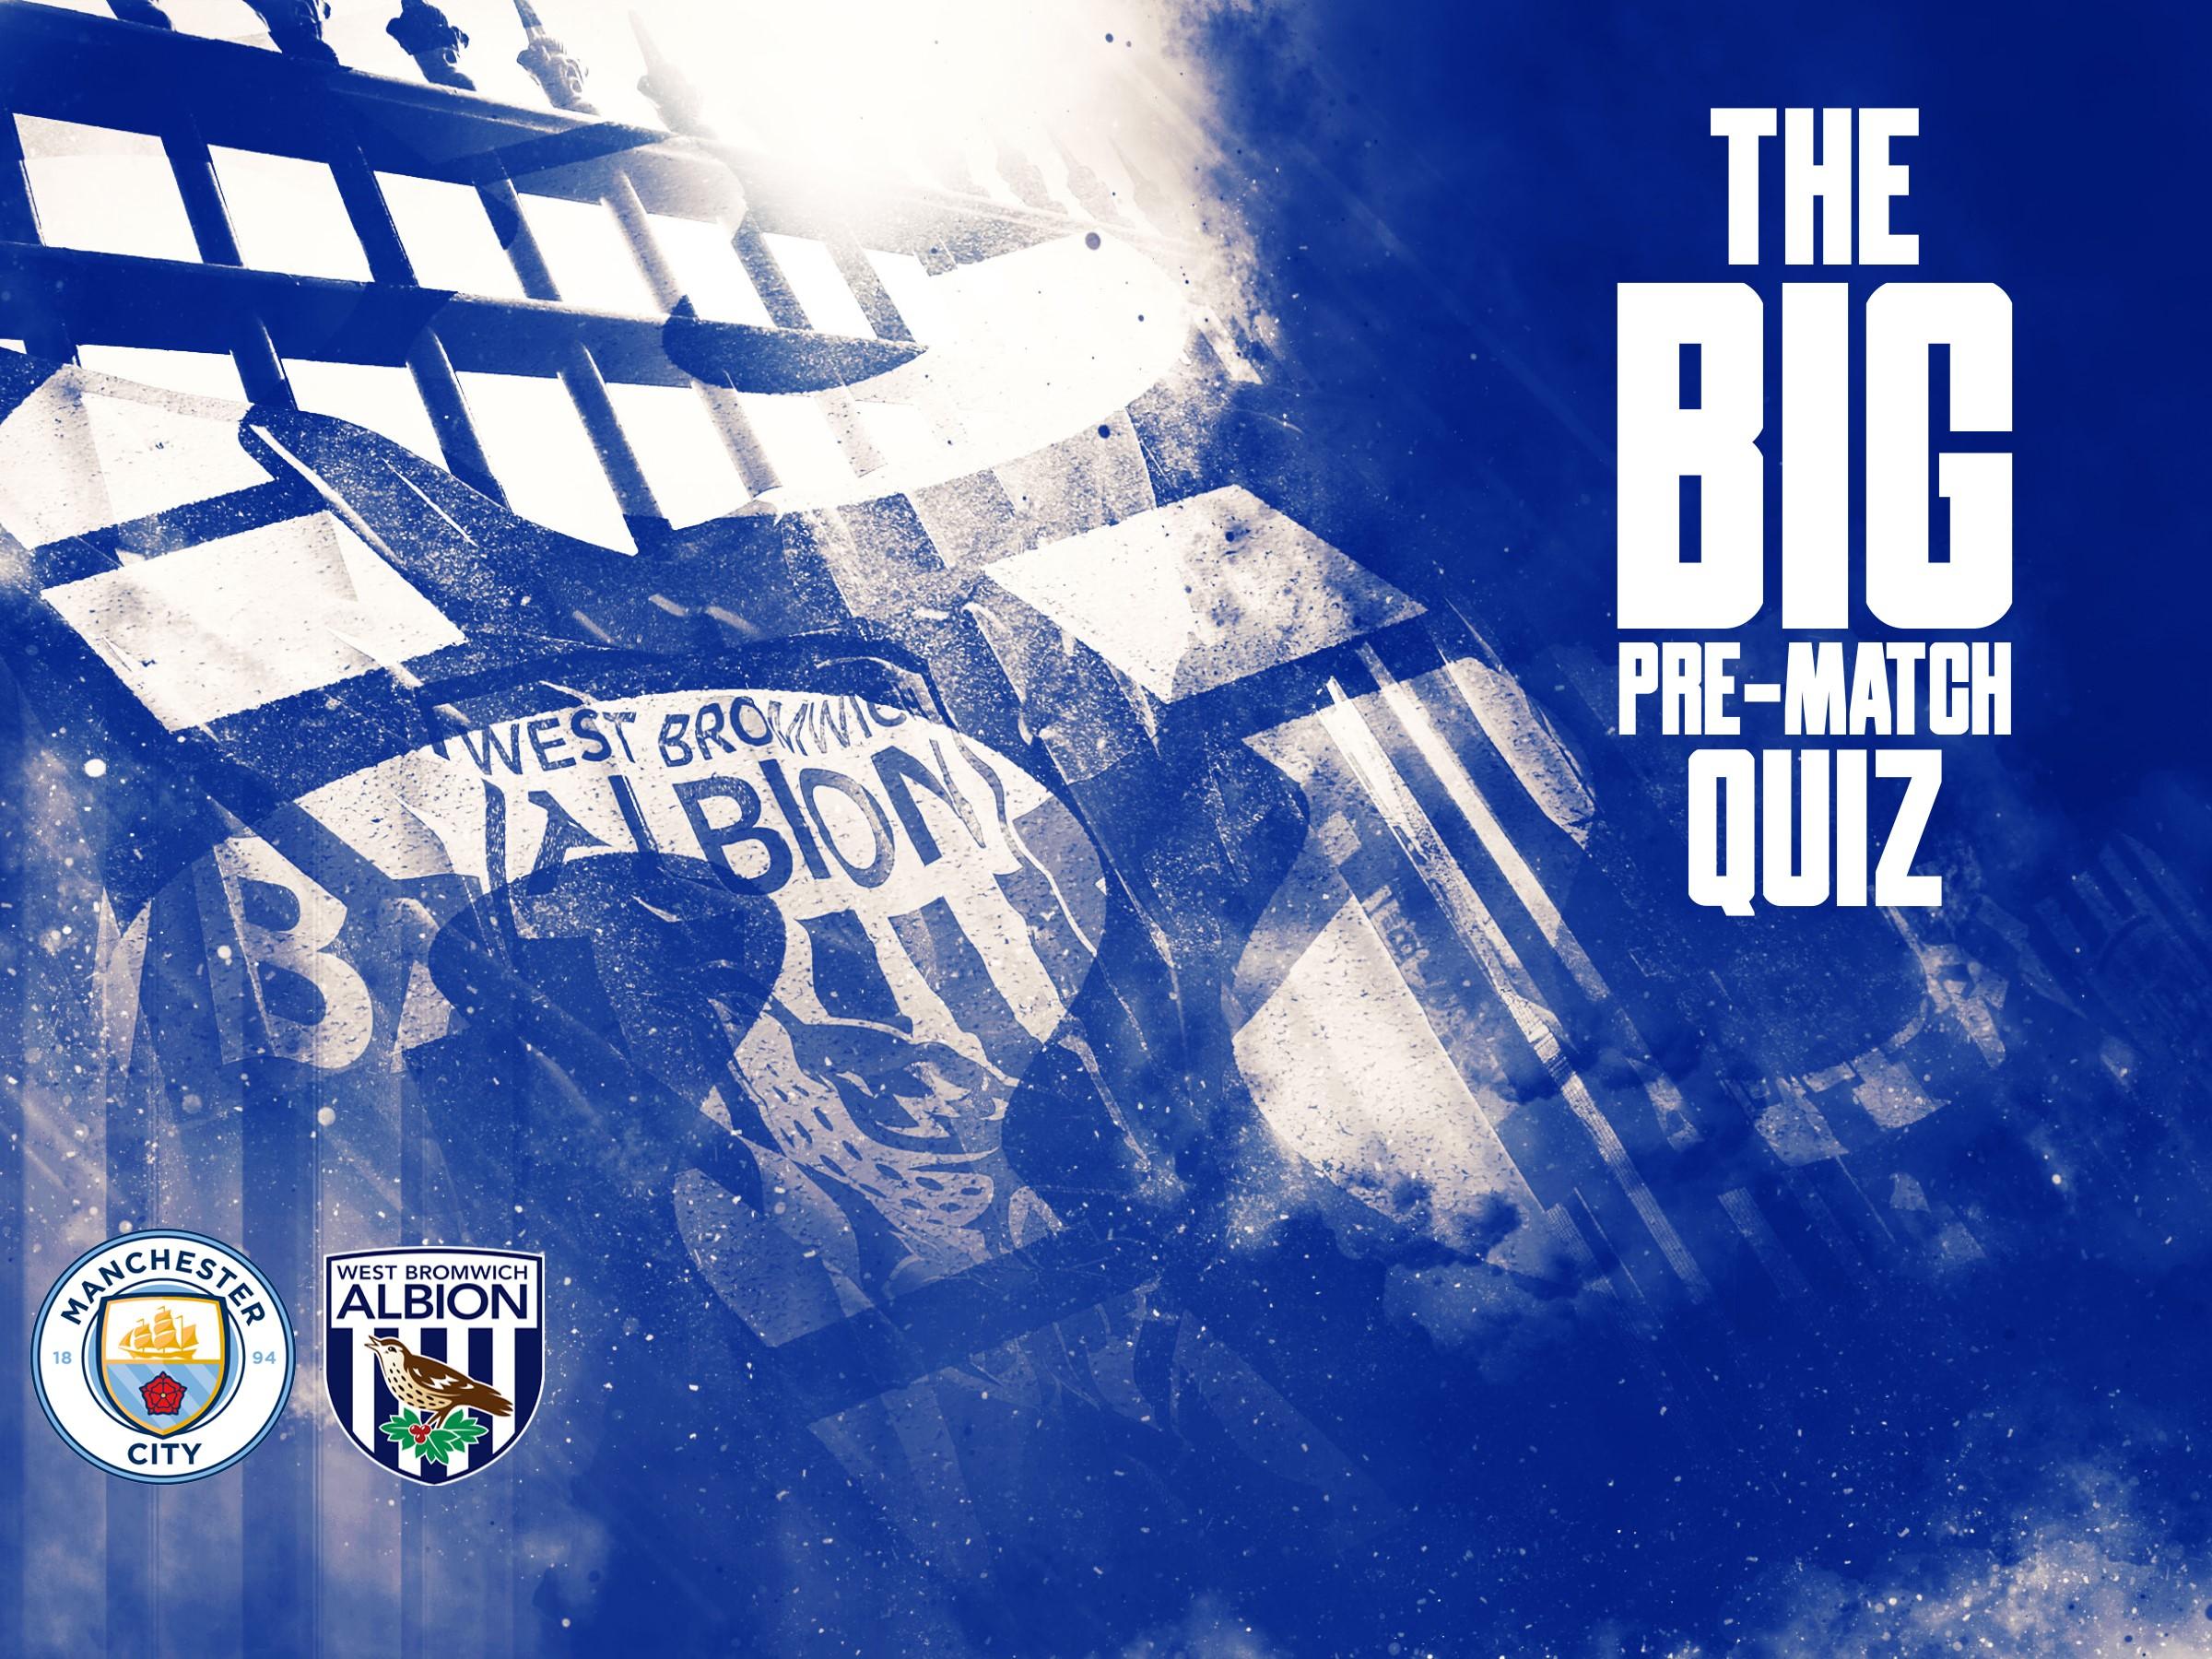 Man City quiz